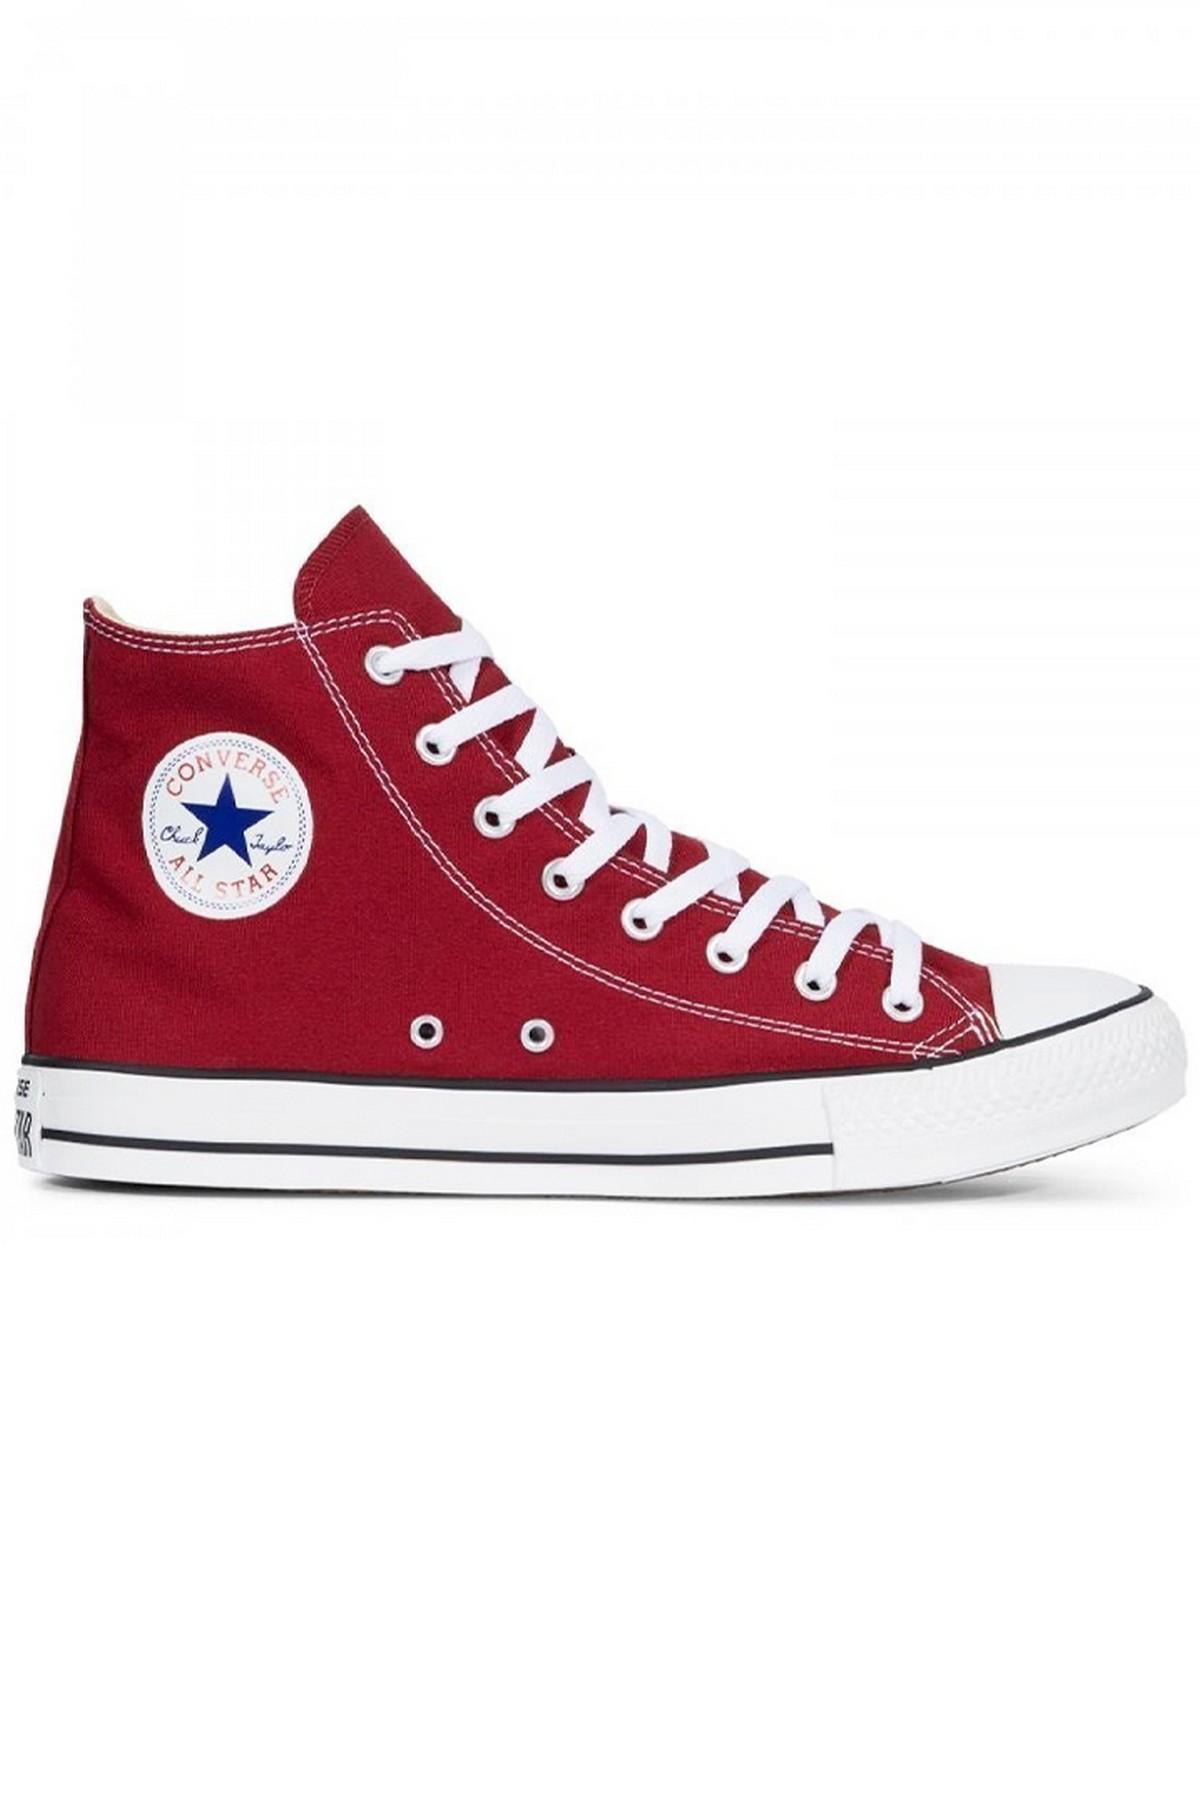 Converse Chuck Taylor All Star Bordo Sneaker (M9613)